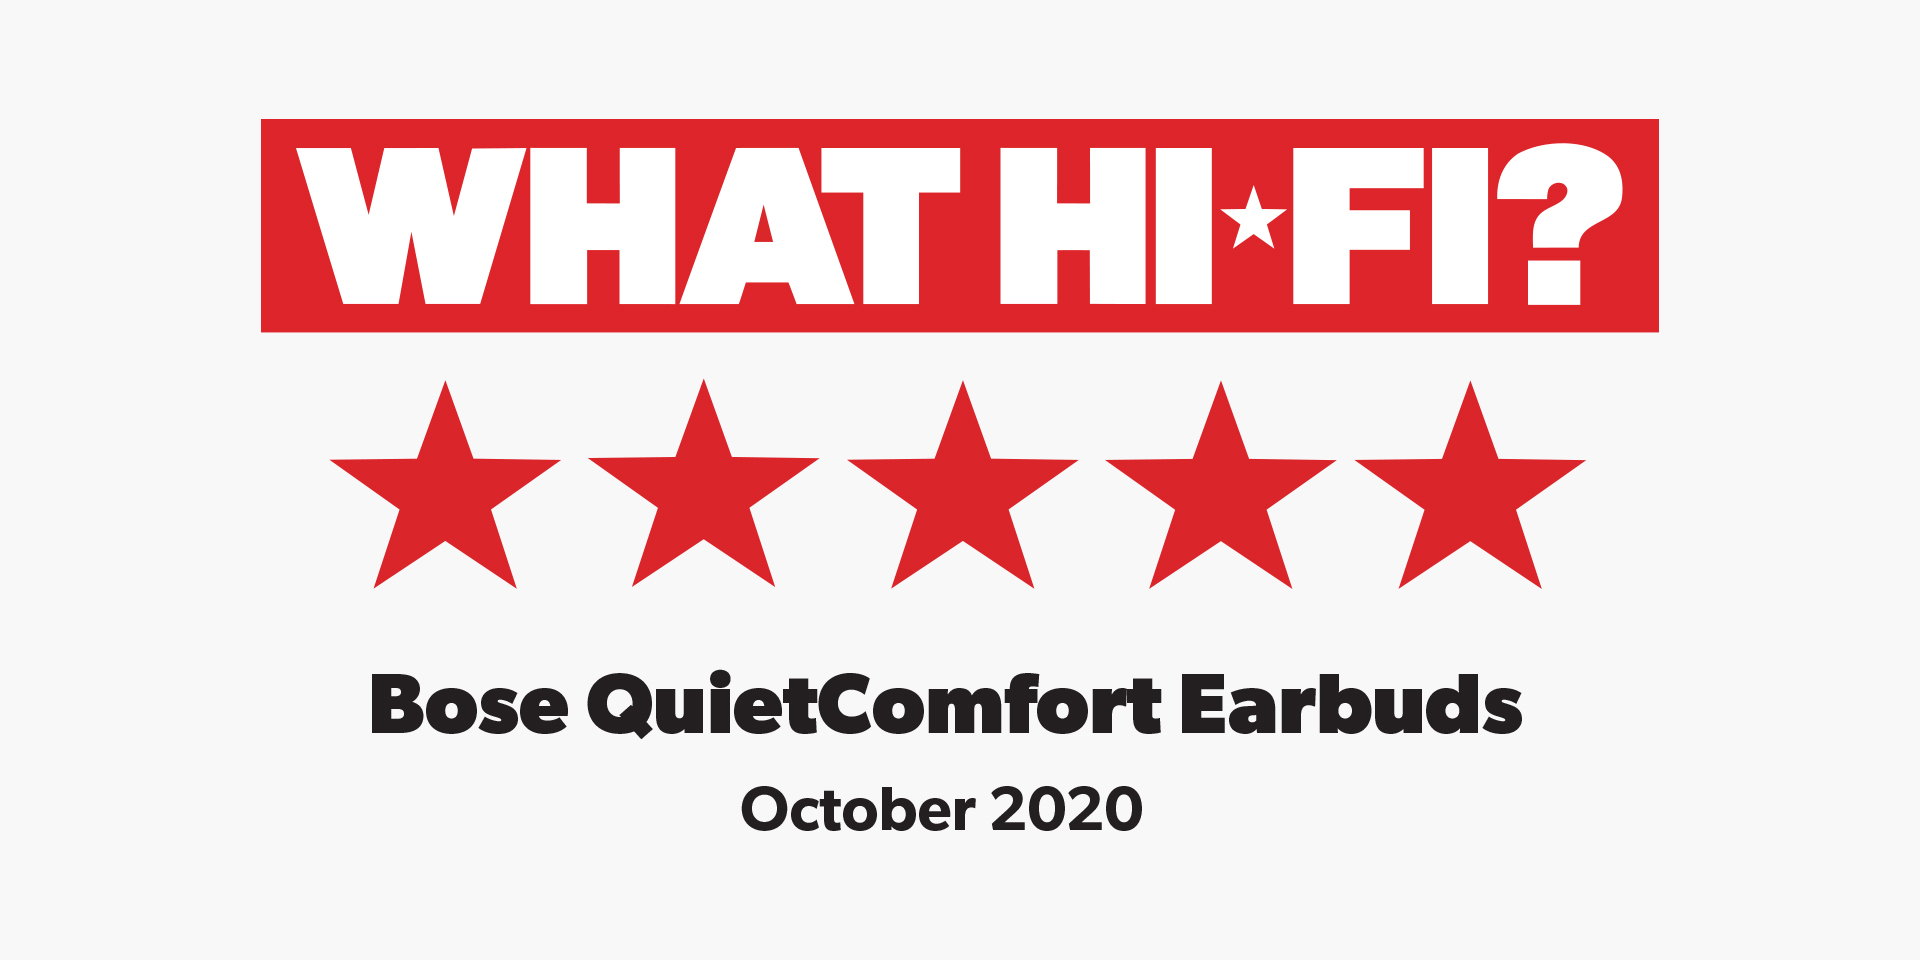 What Hi-Fi?, 5 stars, Bose QuietComfort Earbuds, October 2020 logo